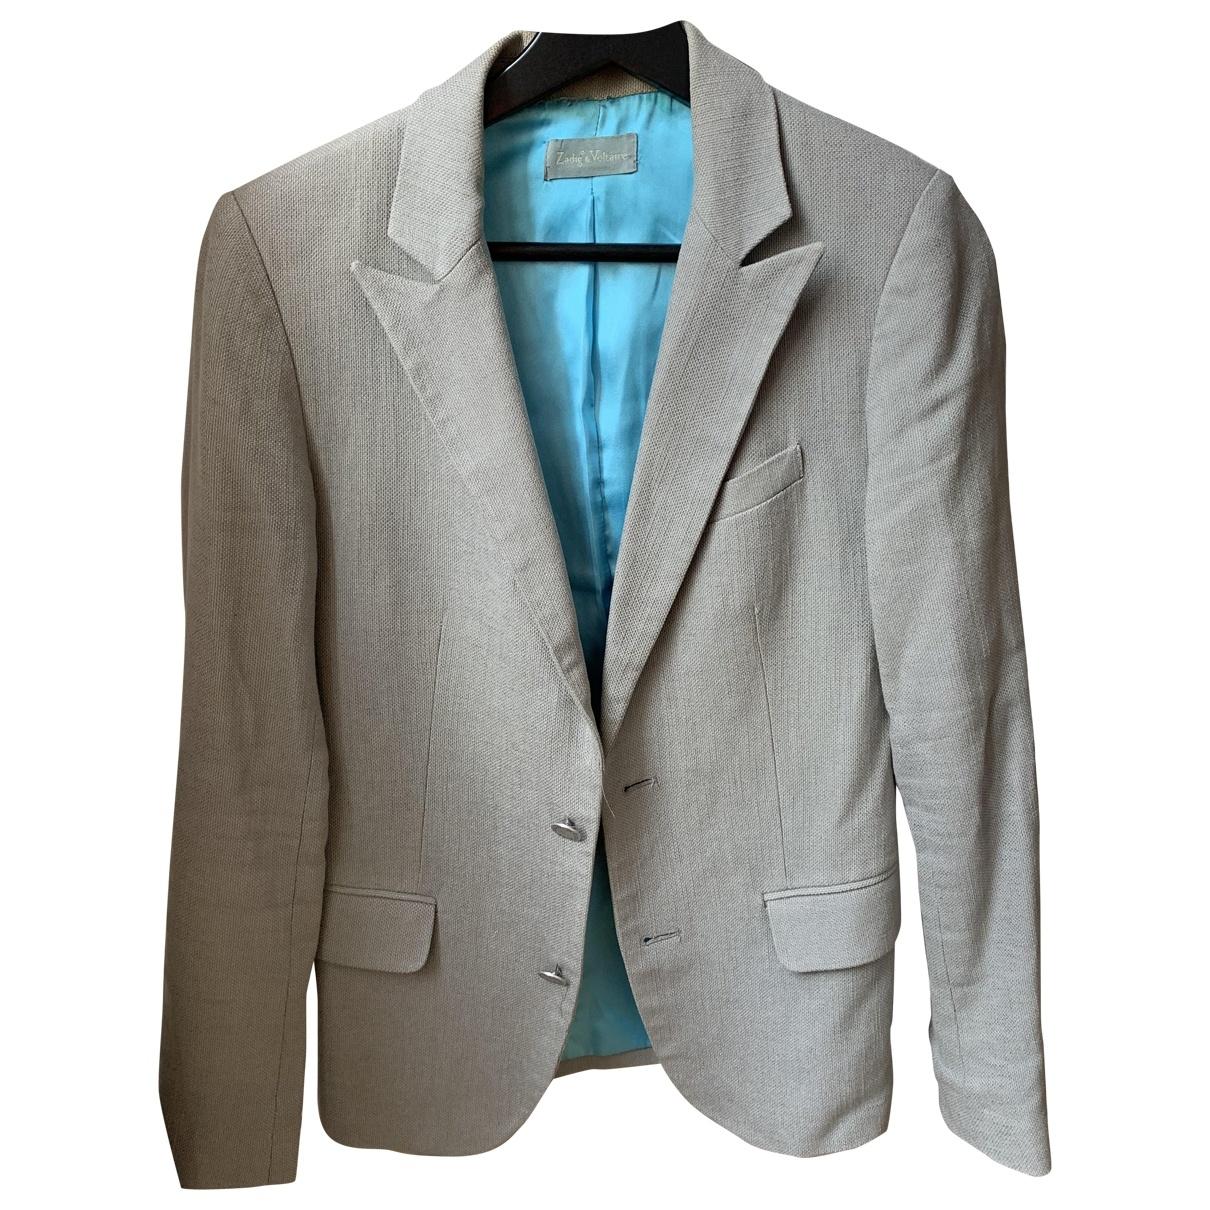 Zadig & Voltaire \N Grey Cotton jacket for Women S International